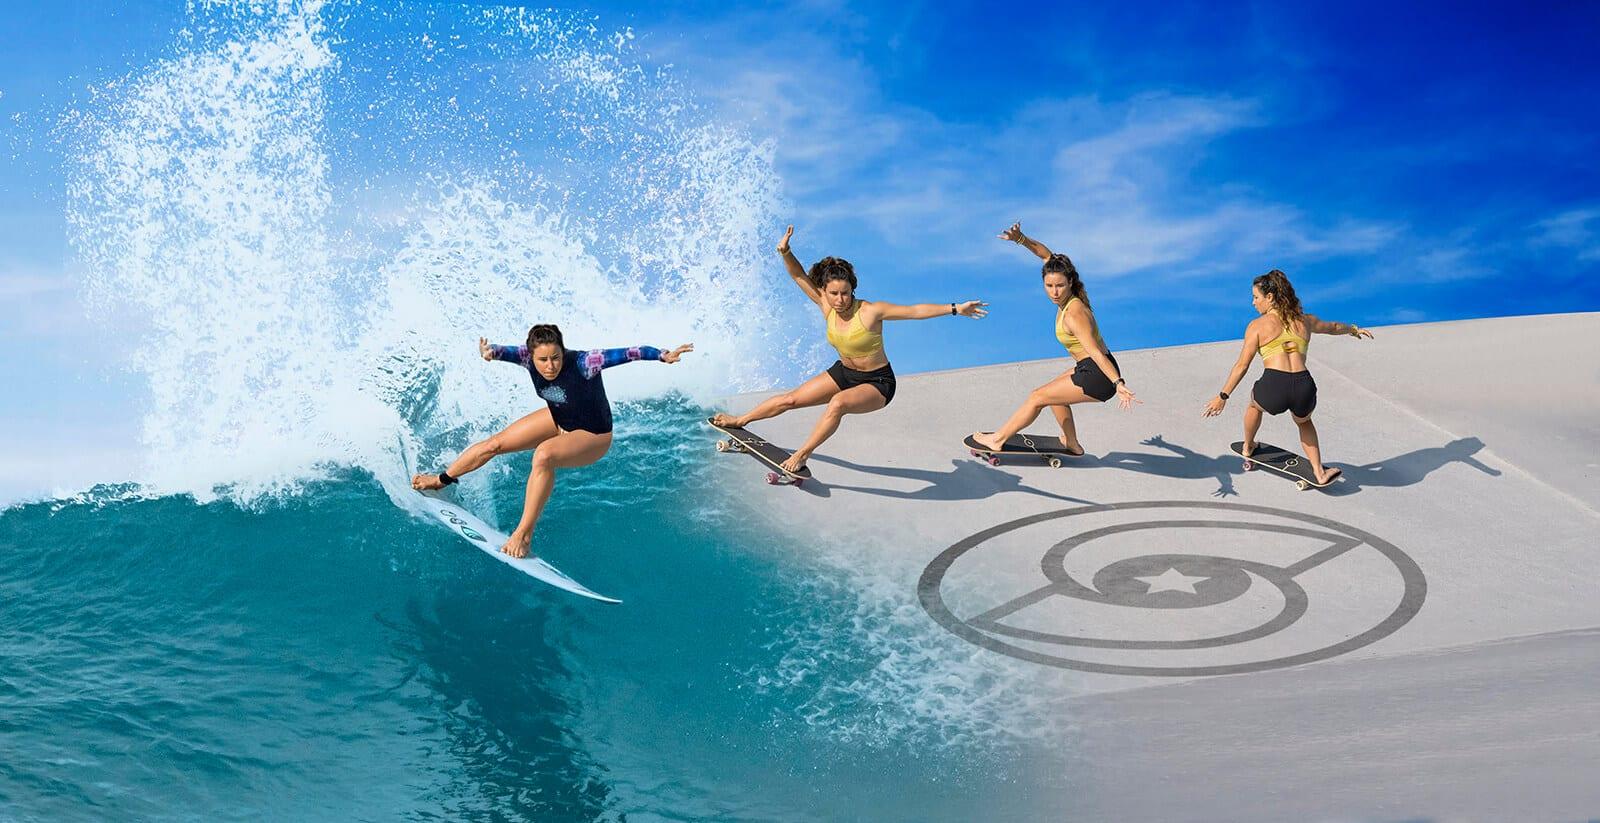 critical surf turns simulating johanne defay